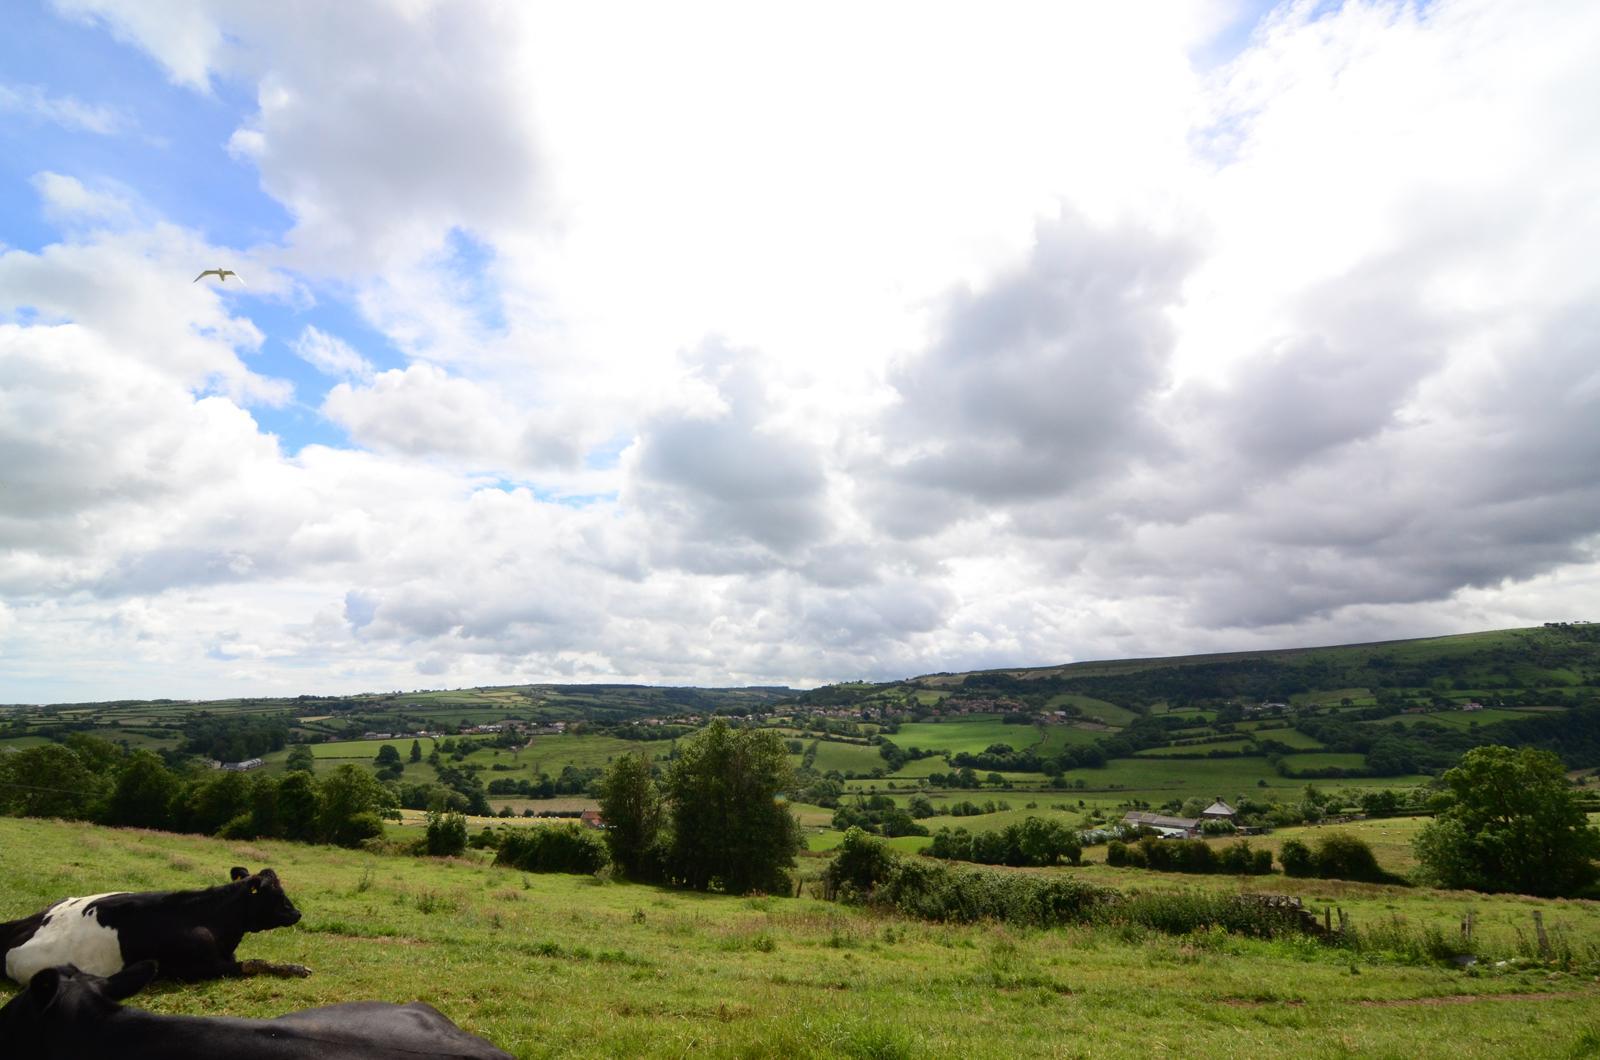 Esk Valley near Whitby